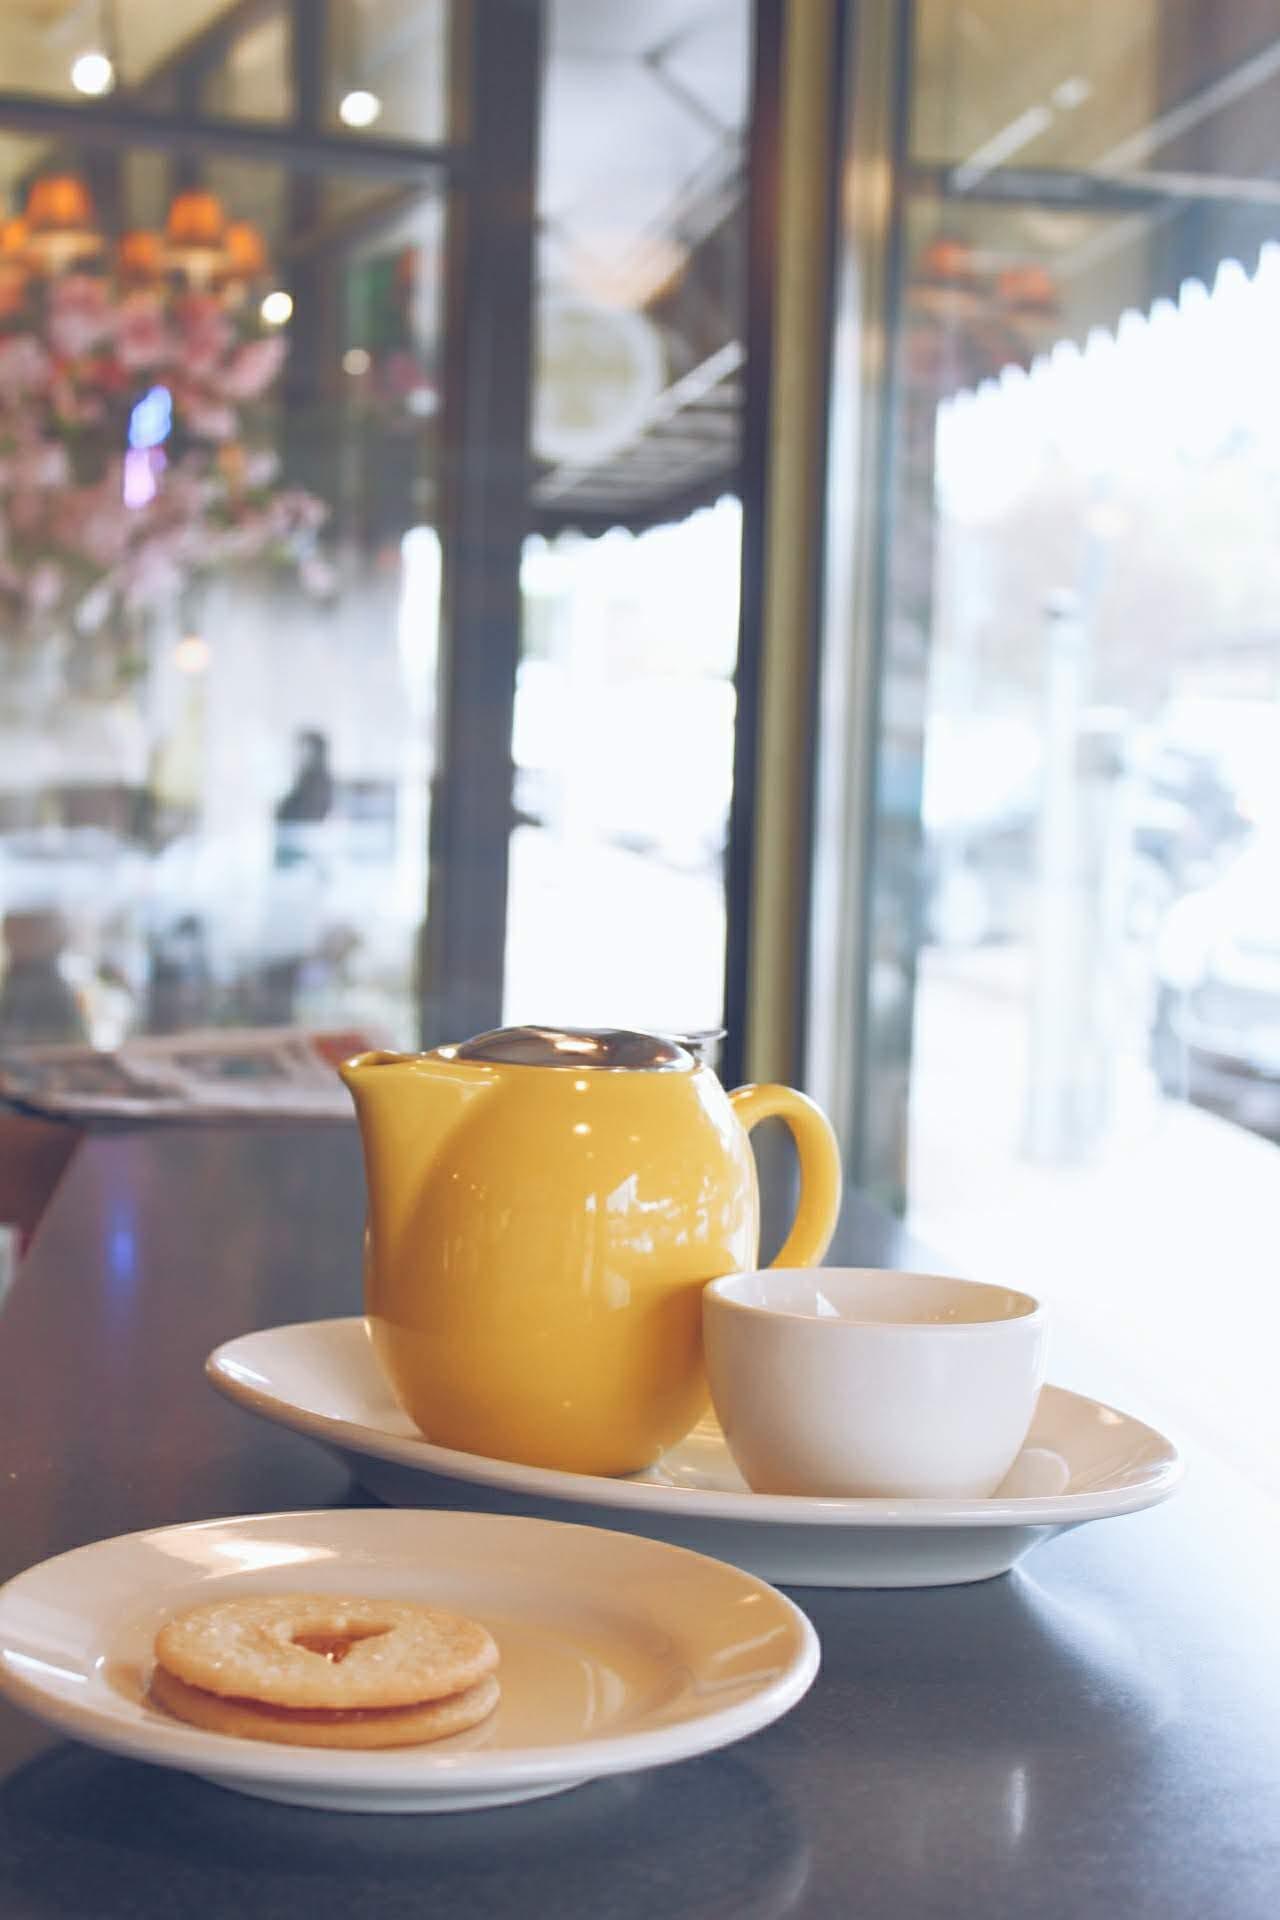 tea and cookie inside restaurant window